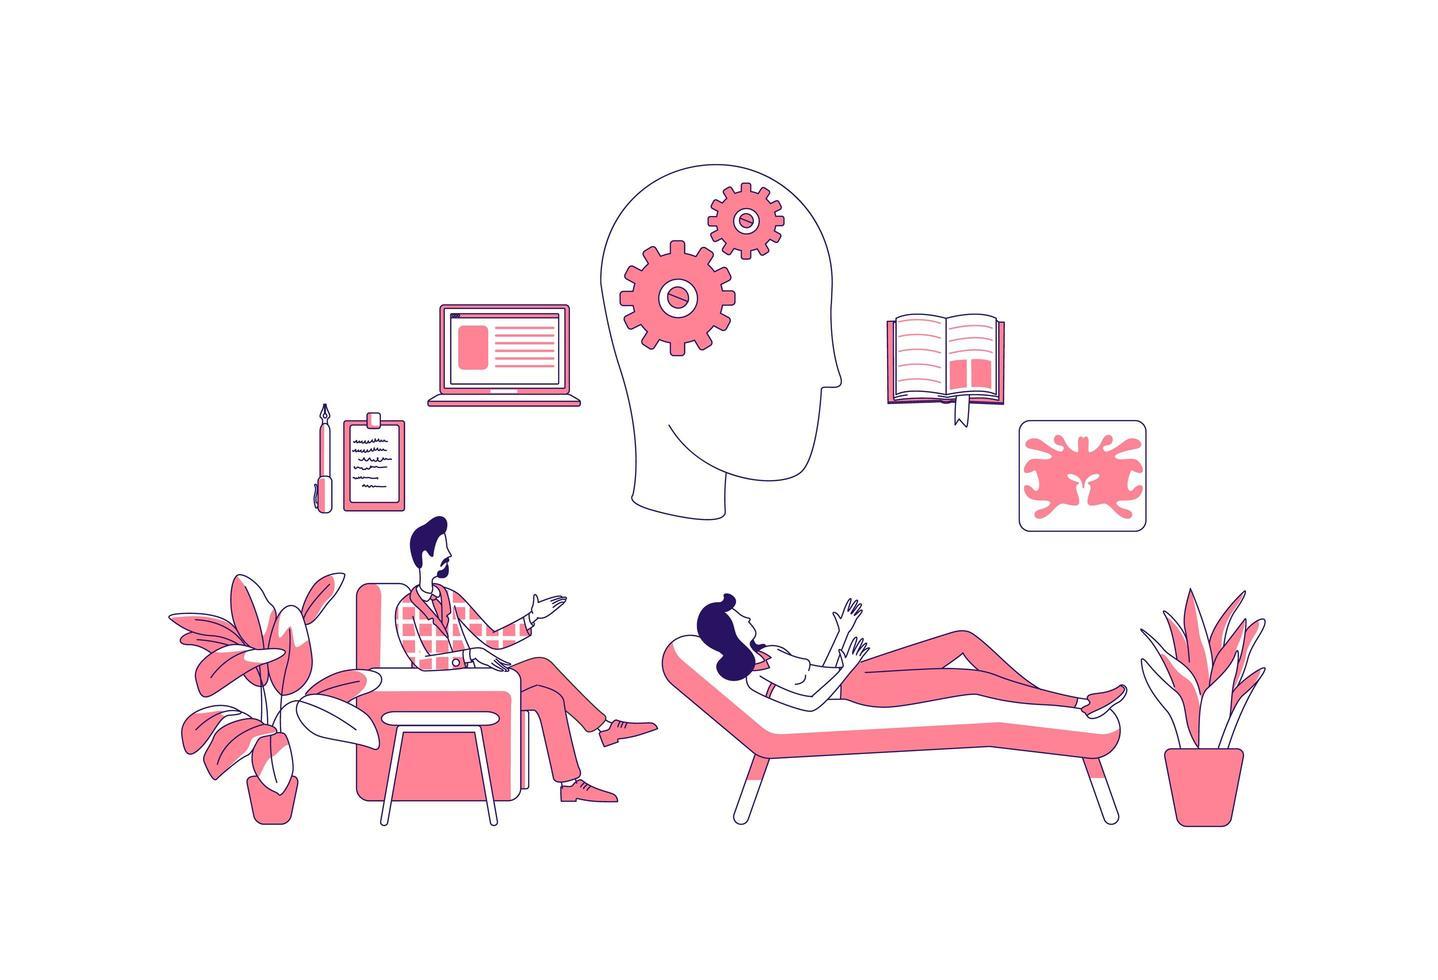 terapia psicológica com paciente vetor